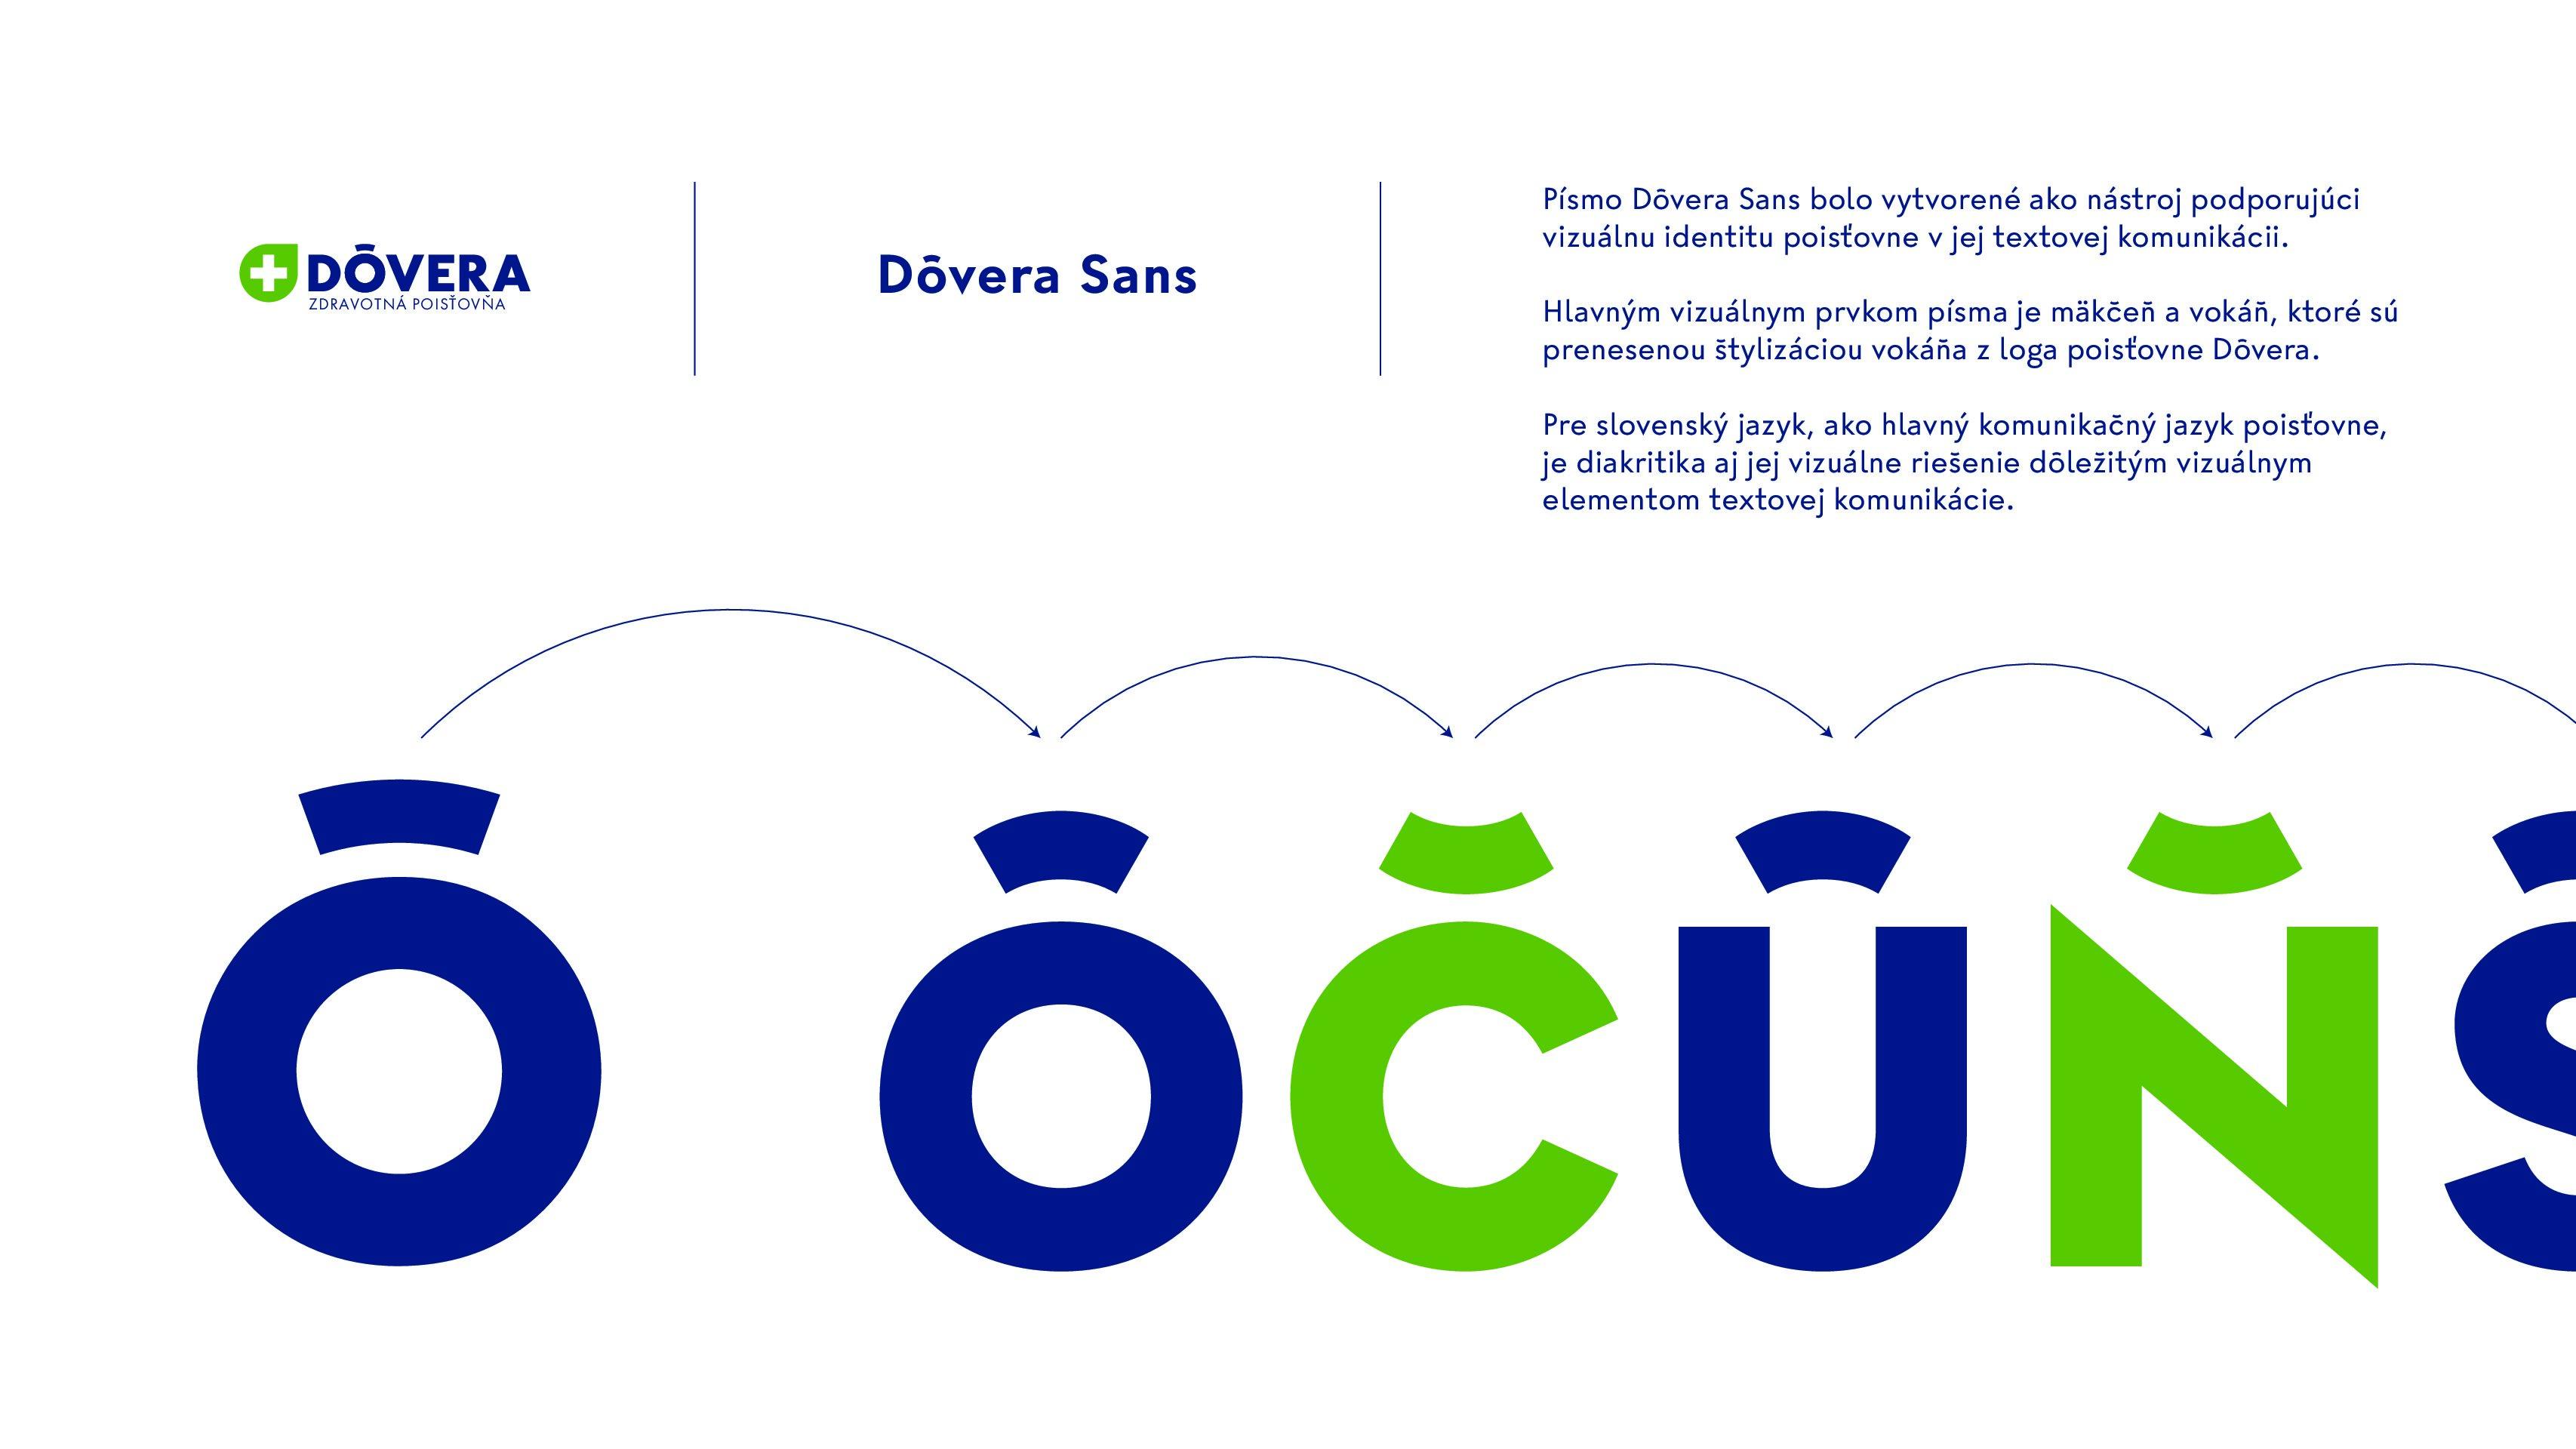 DÔVERA SANS